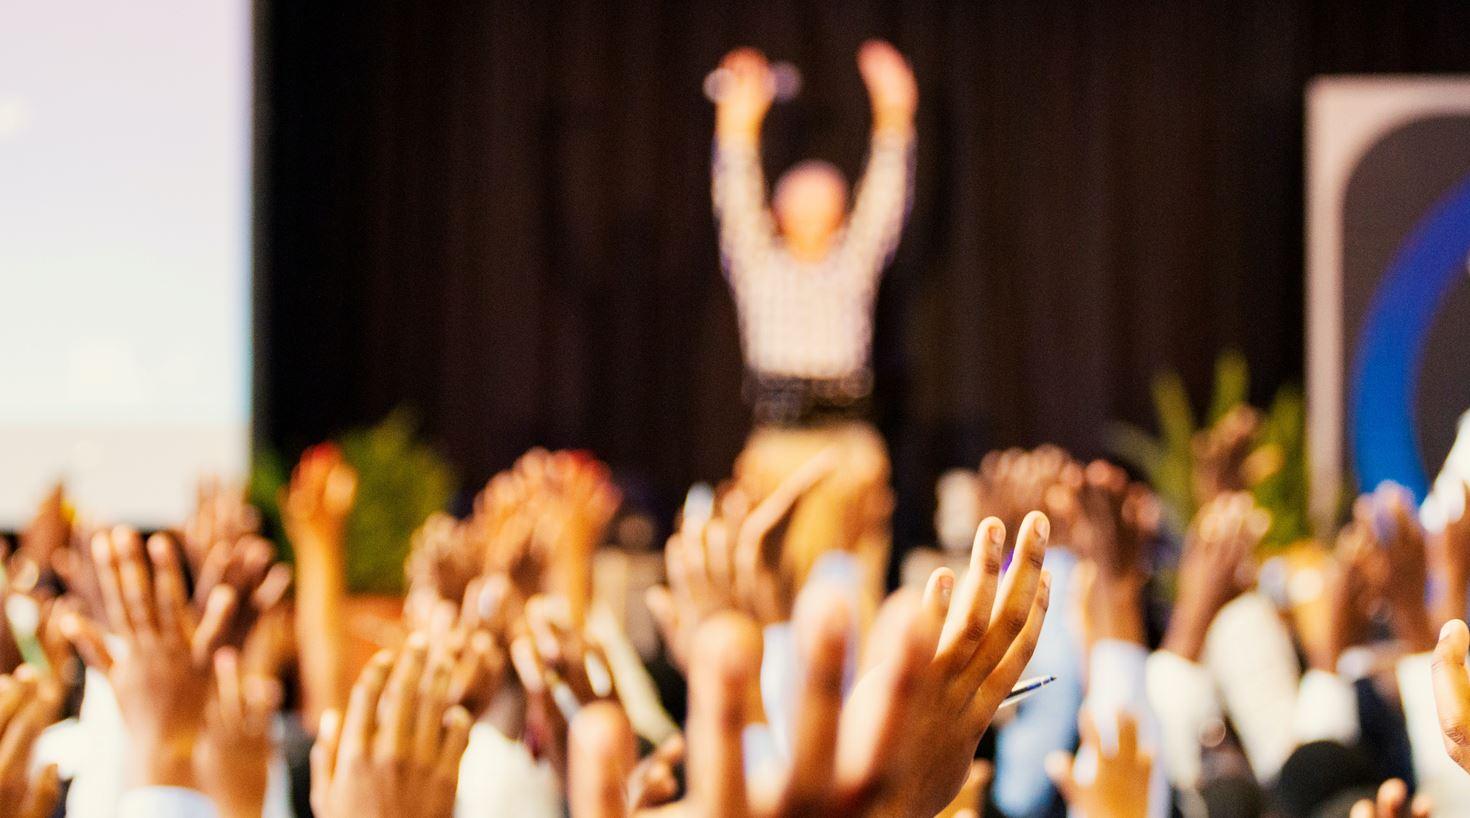 En stor gruppe mennesker er samlet og strekker armene i været fordi de deltar på CX-workshops i kundebegeistring.